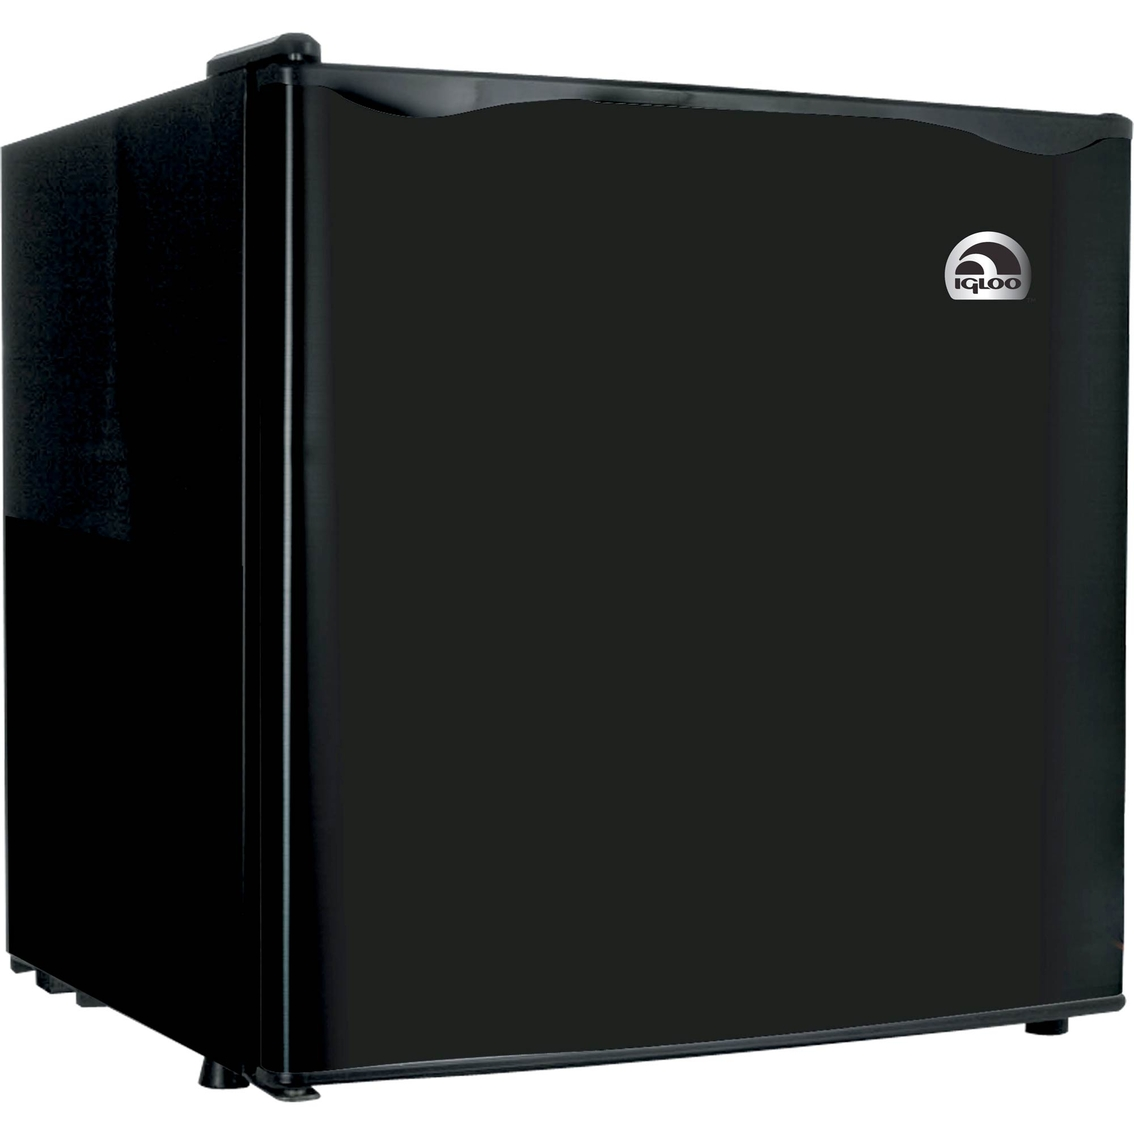 Igloo 1 7 Cu Ft Bar Fridge Refrigerators Home